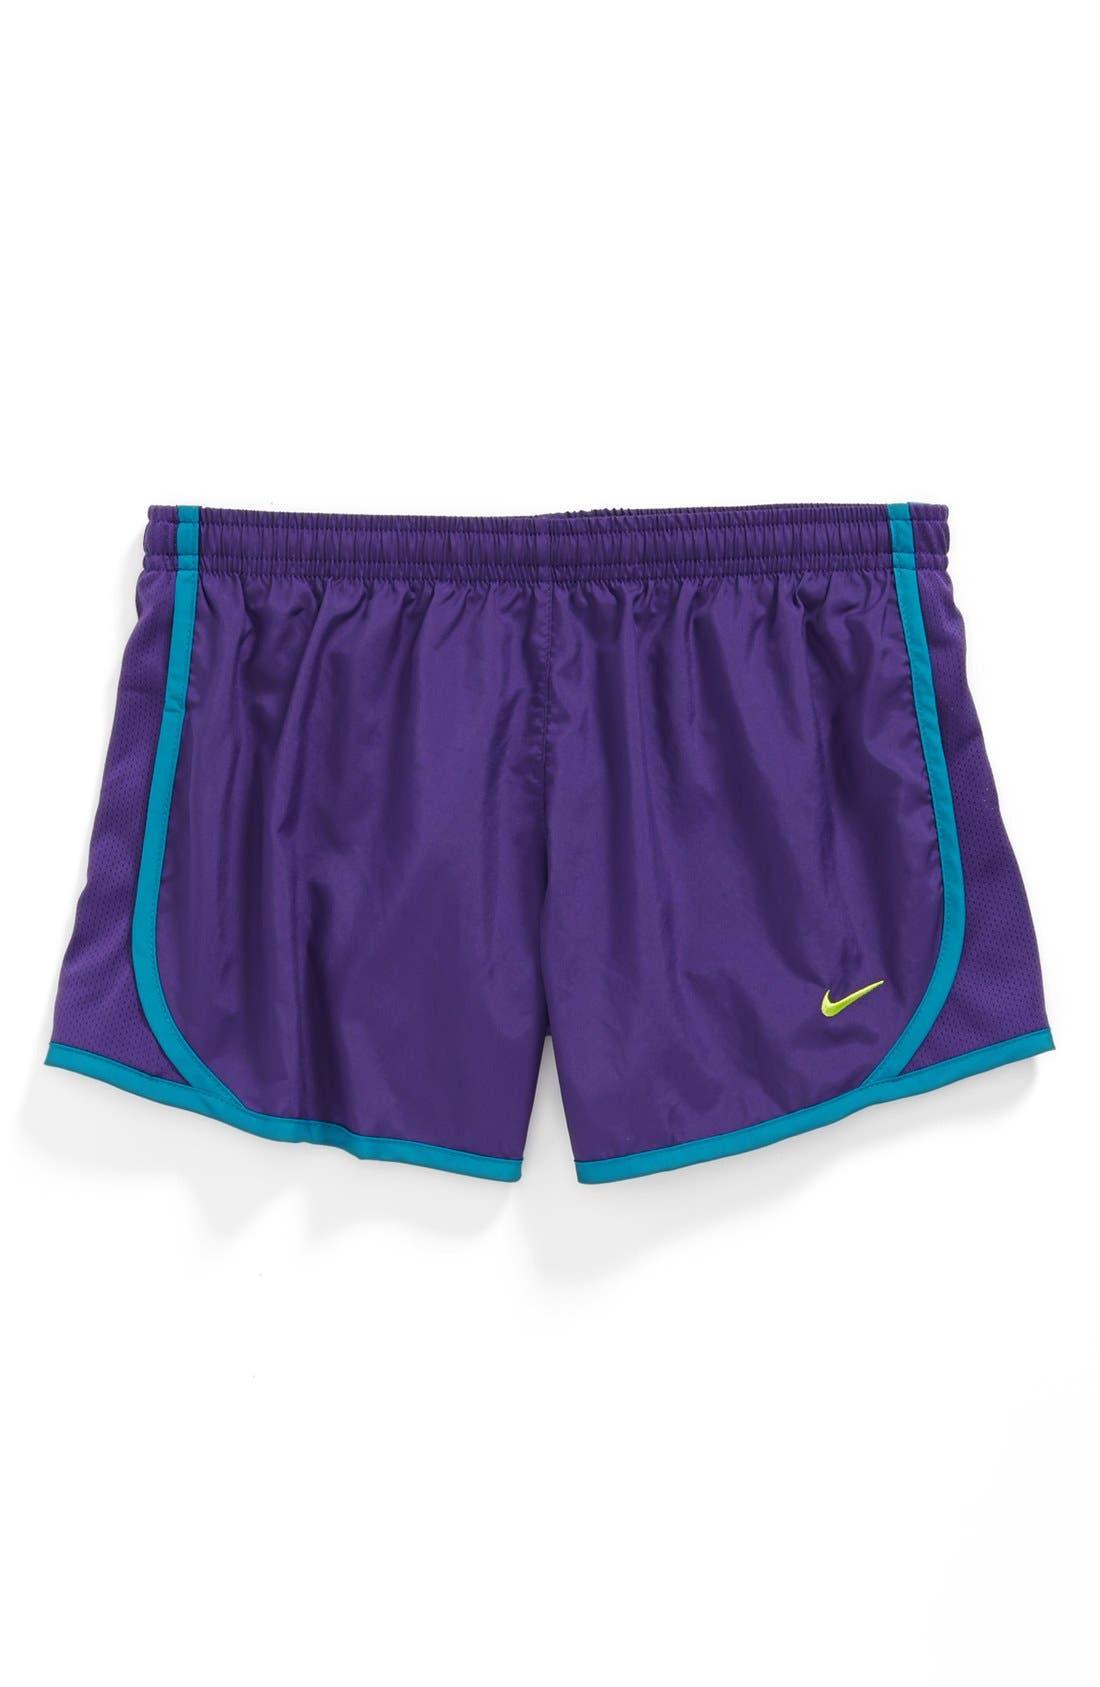 Alternate Image 1 Selected - Nike 'Tempo' Track Shorts (Little Girls & Big Girls)